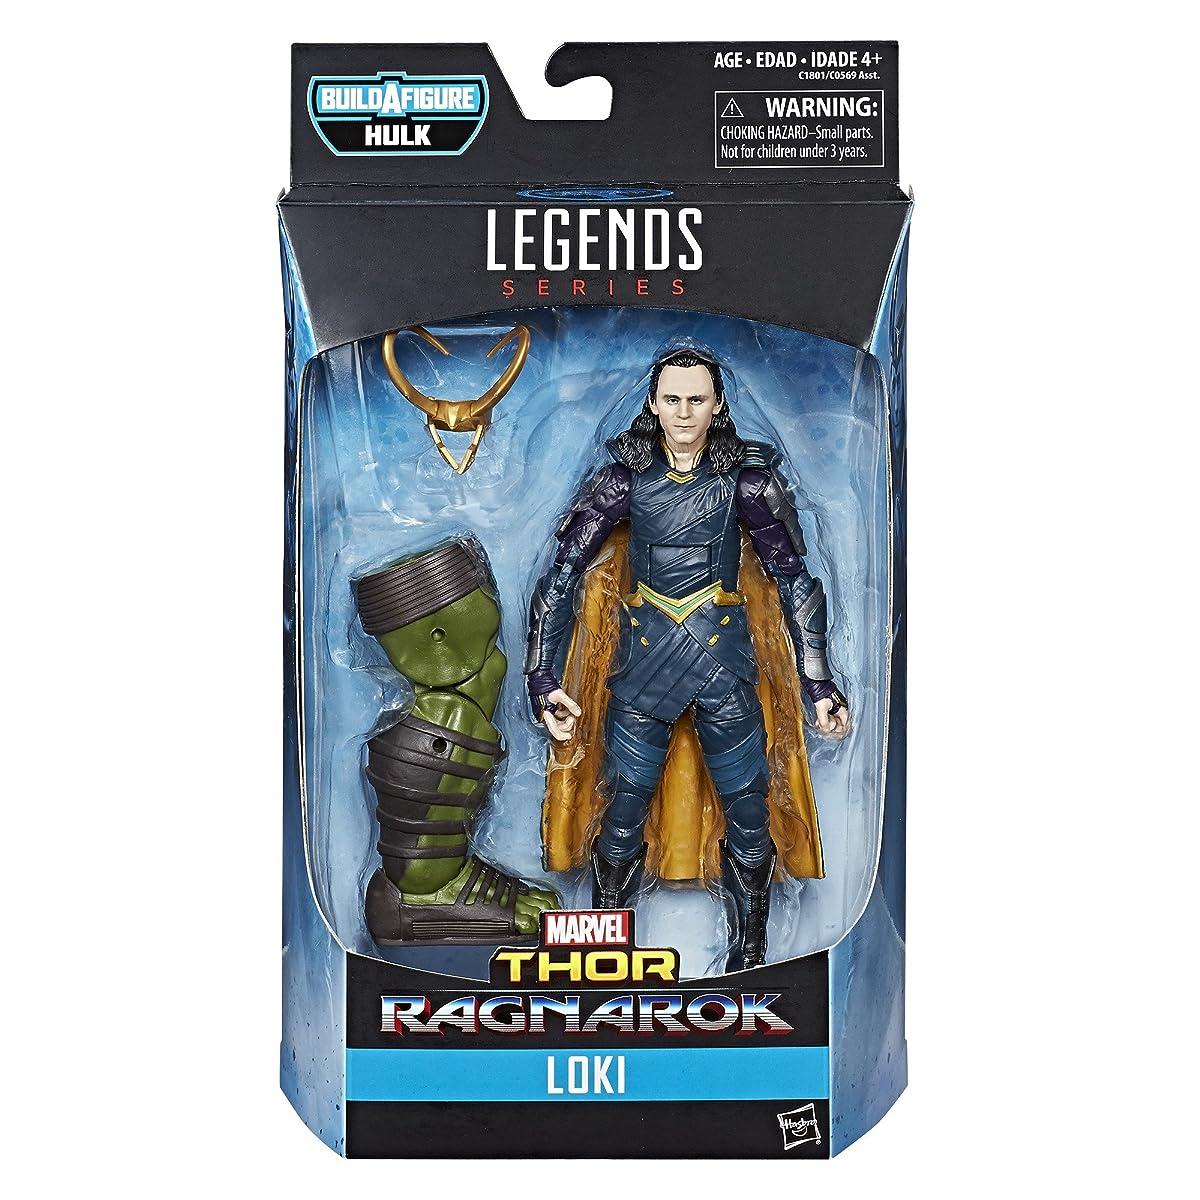 Marvel Thor Legends Series 6-inch Loki